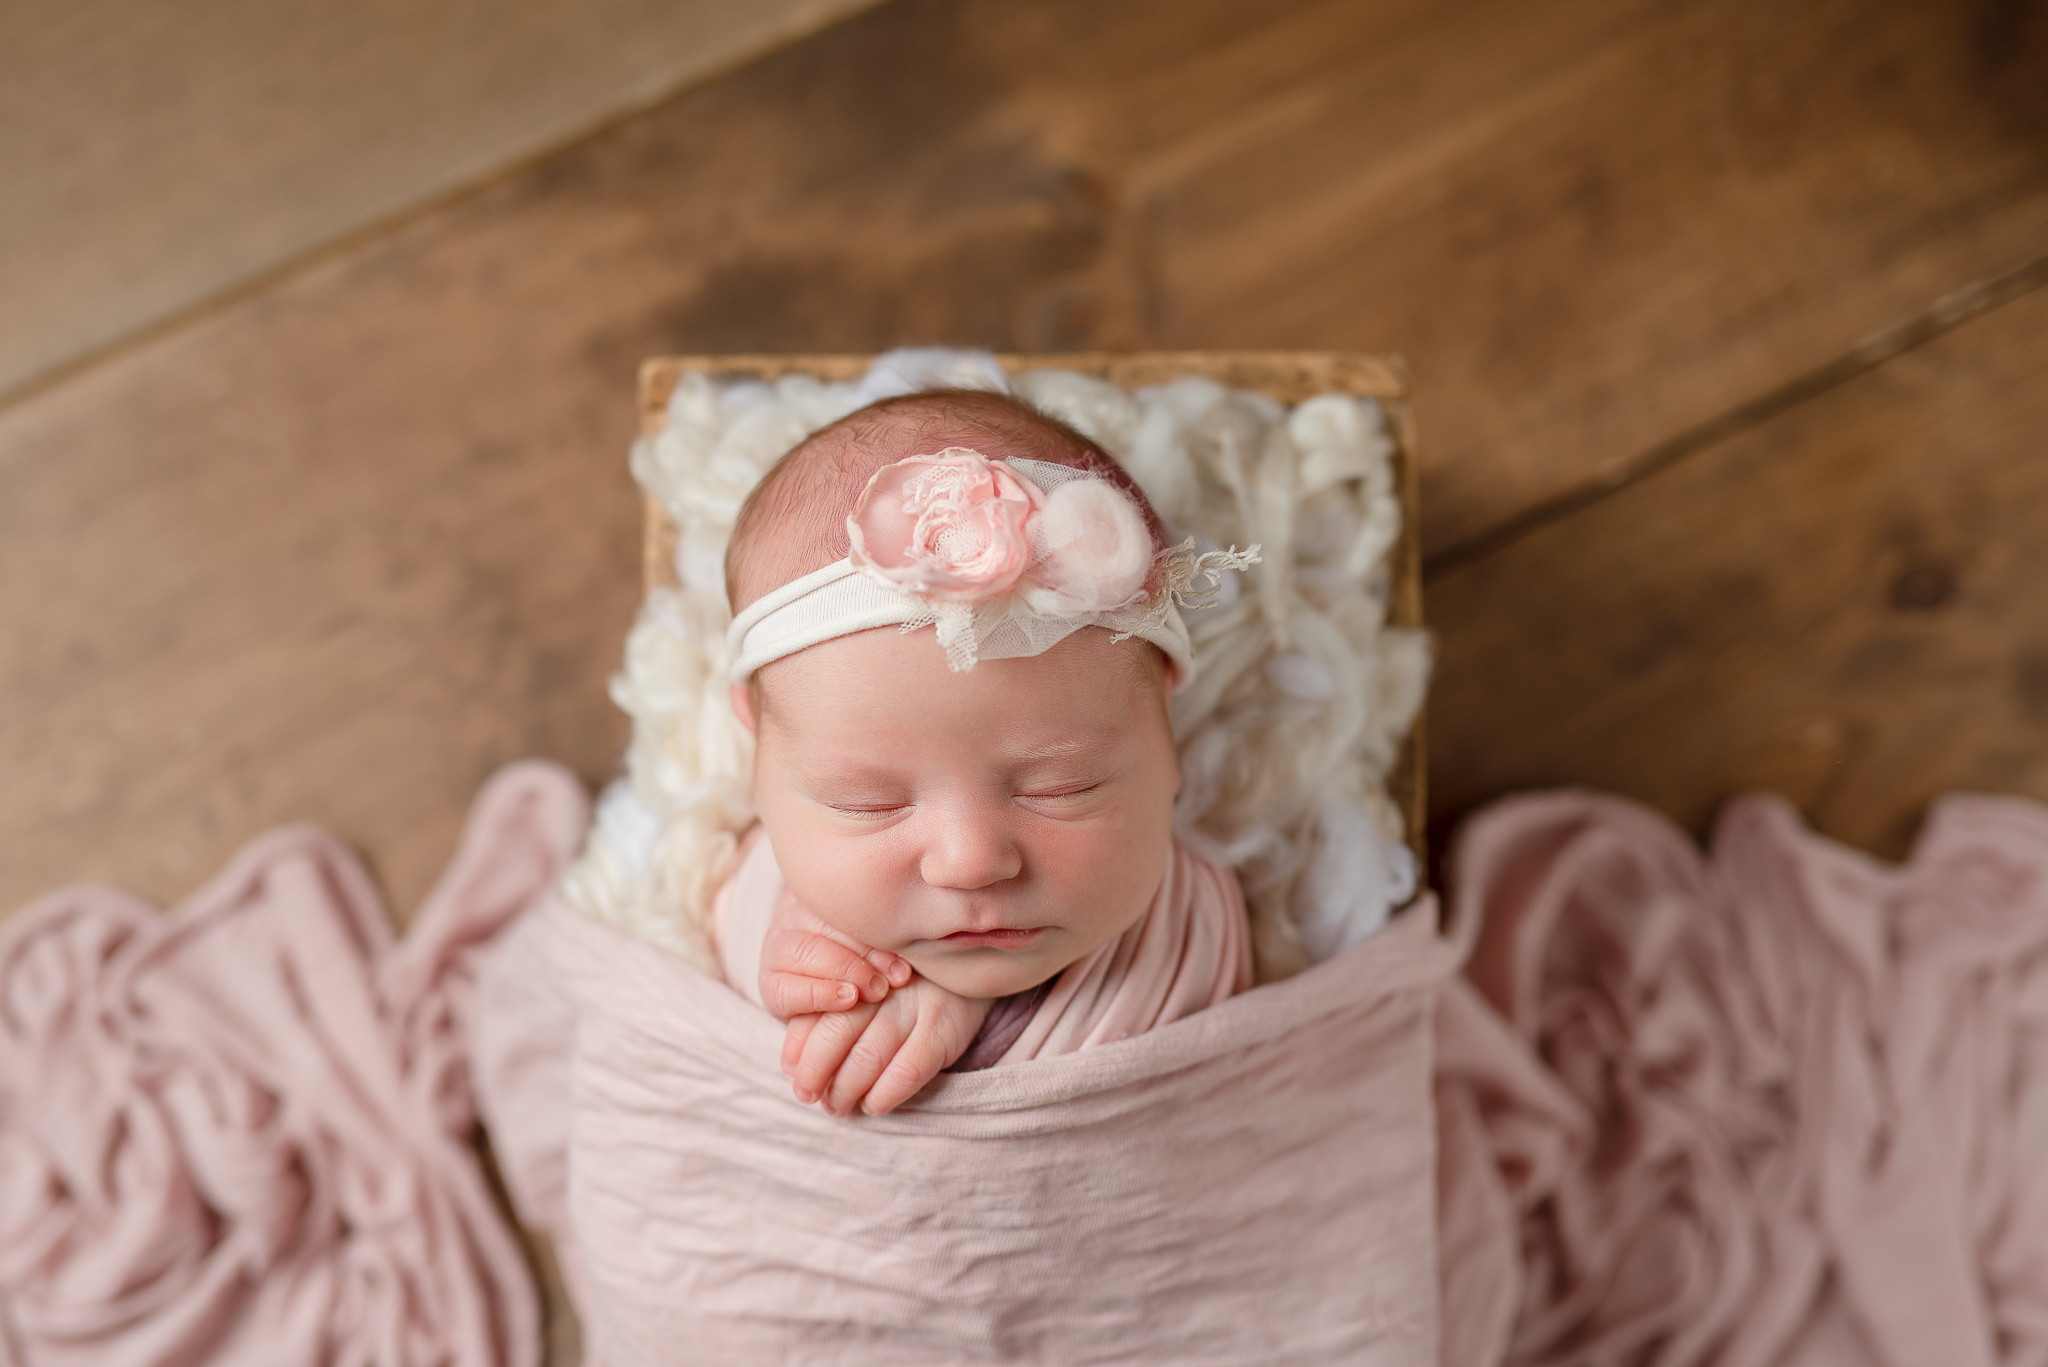 Newborn152NaomiLuciennePhotography032019-2-Edit.jpg